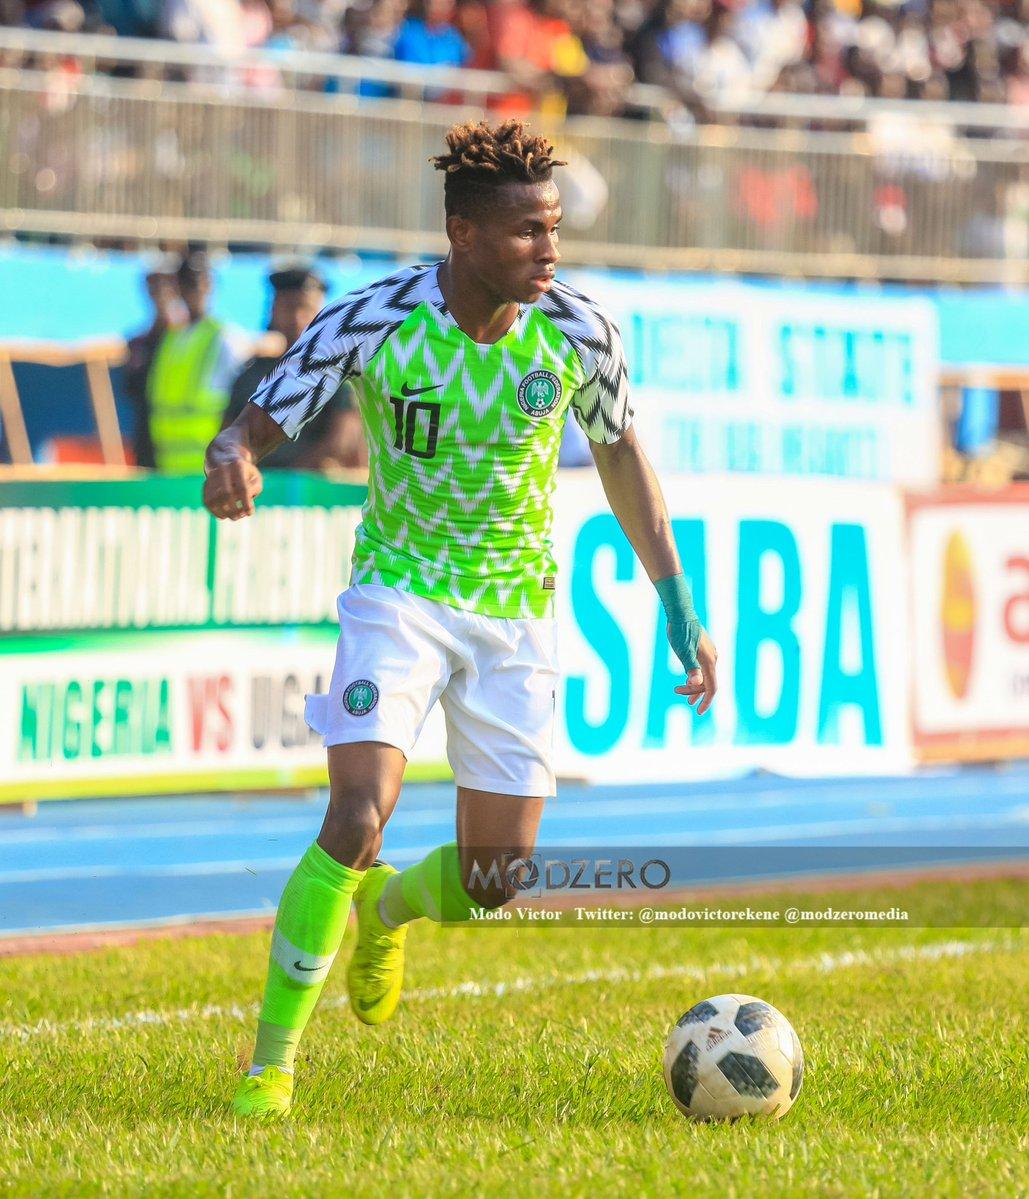 chukwueze2 - Chukwueze: Eagles battle-ready against South Africa